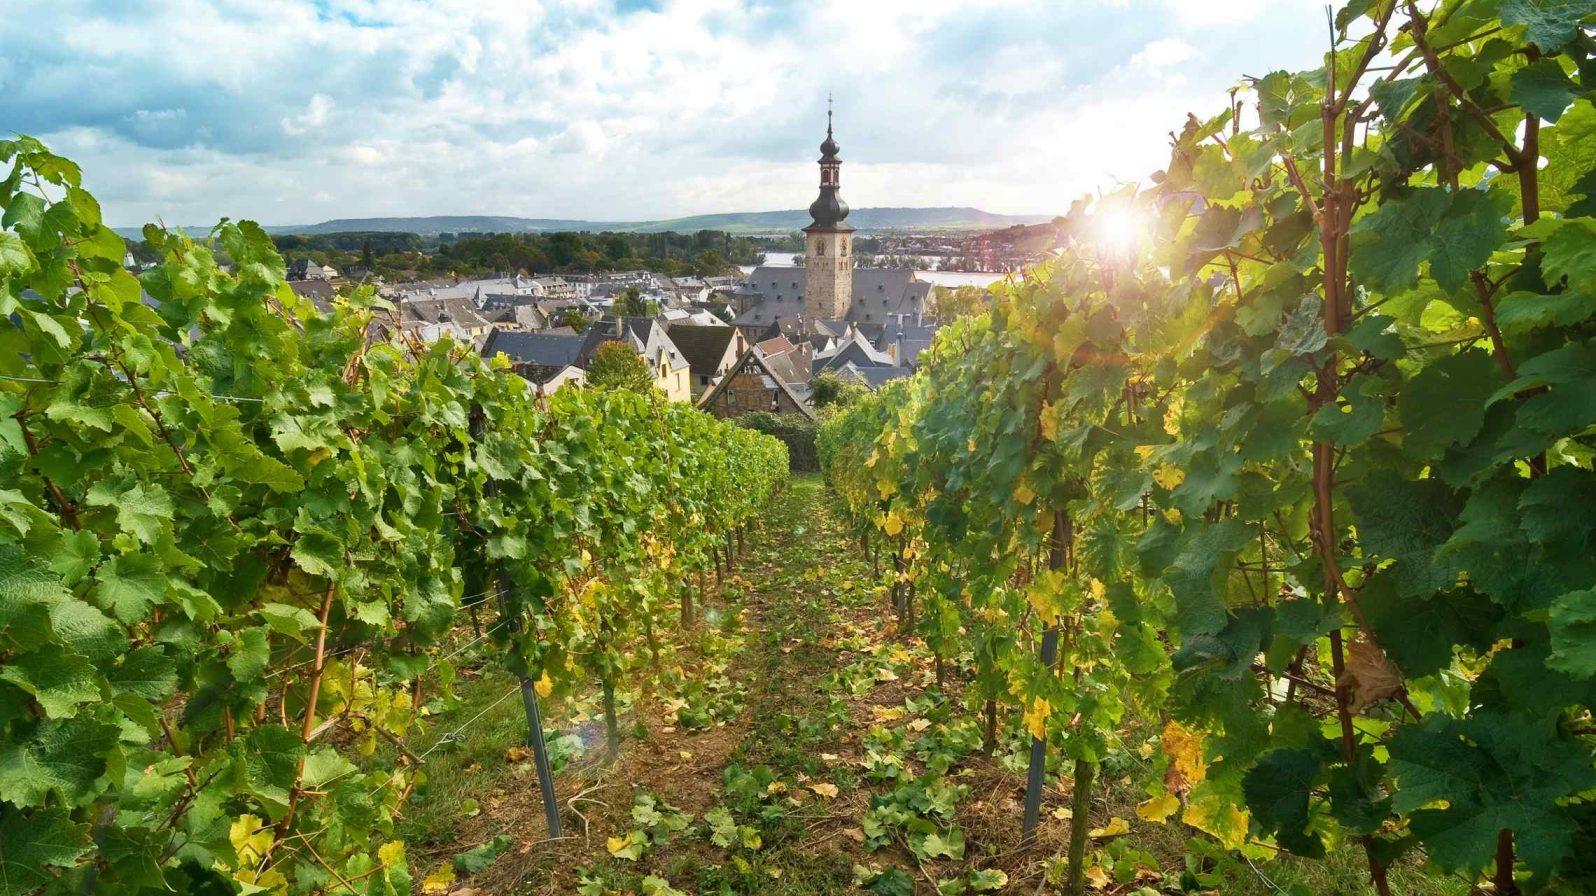 Rüdesheim-viiniviljelys-Saksa-Reinjoki-1596x896.jpg